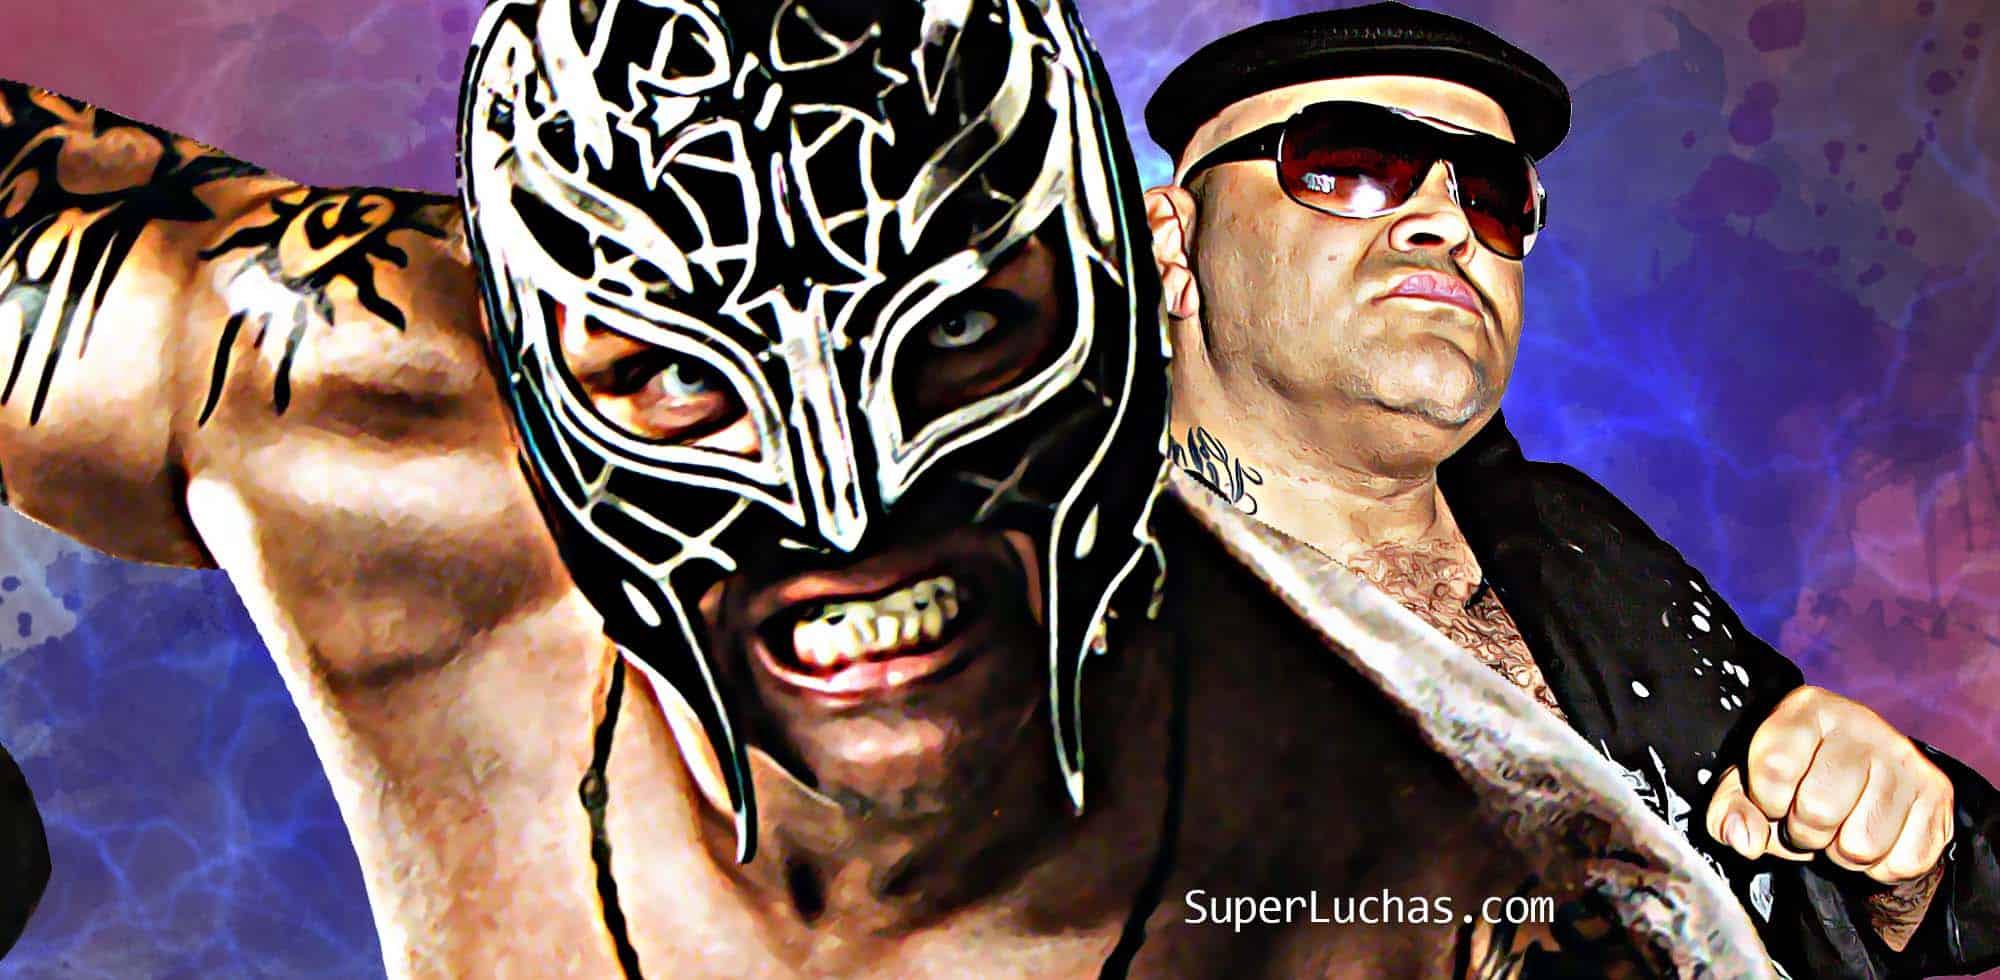 Rey Mysterio Konnan